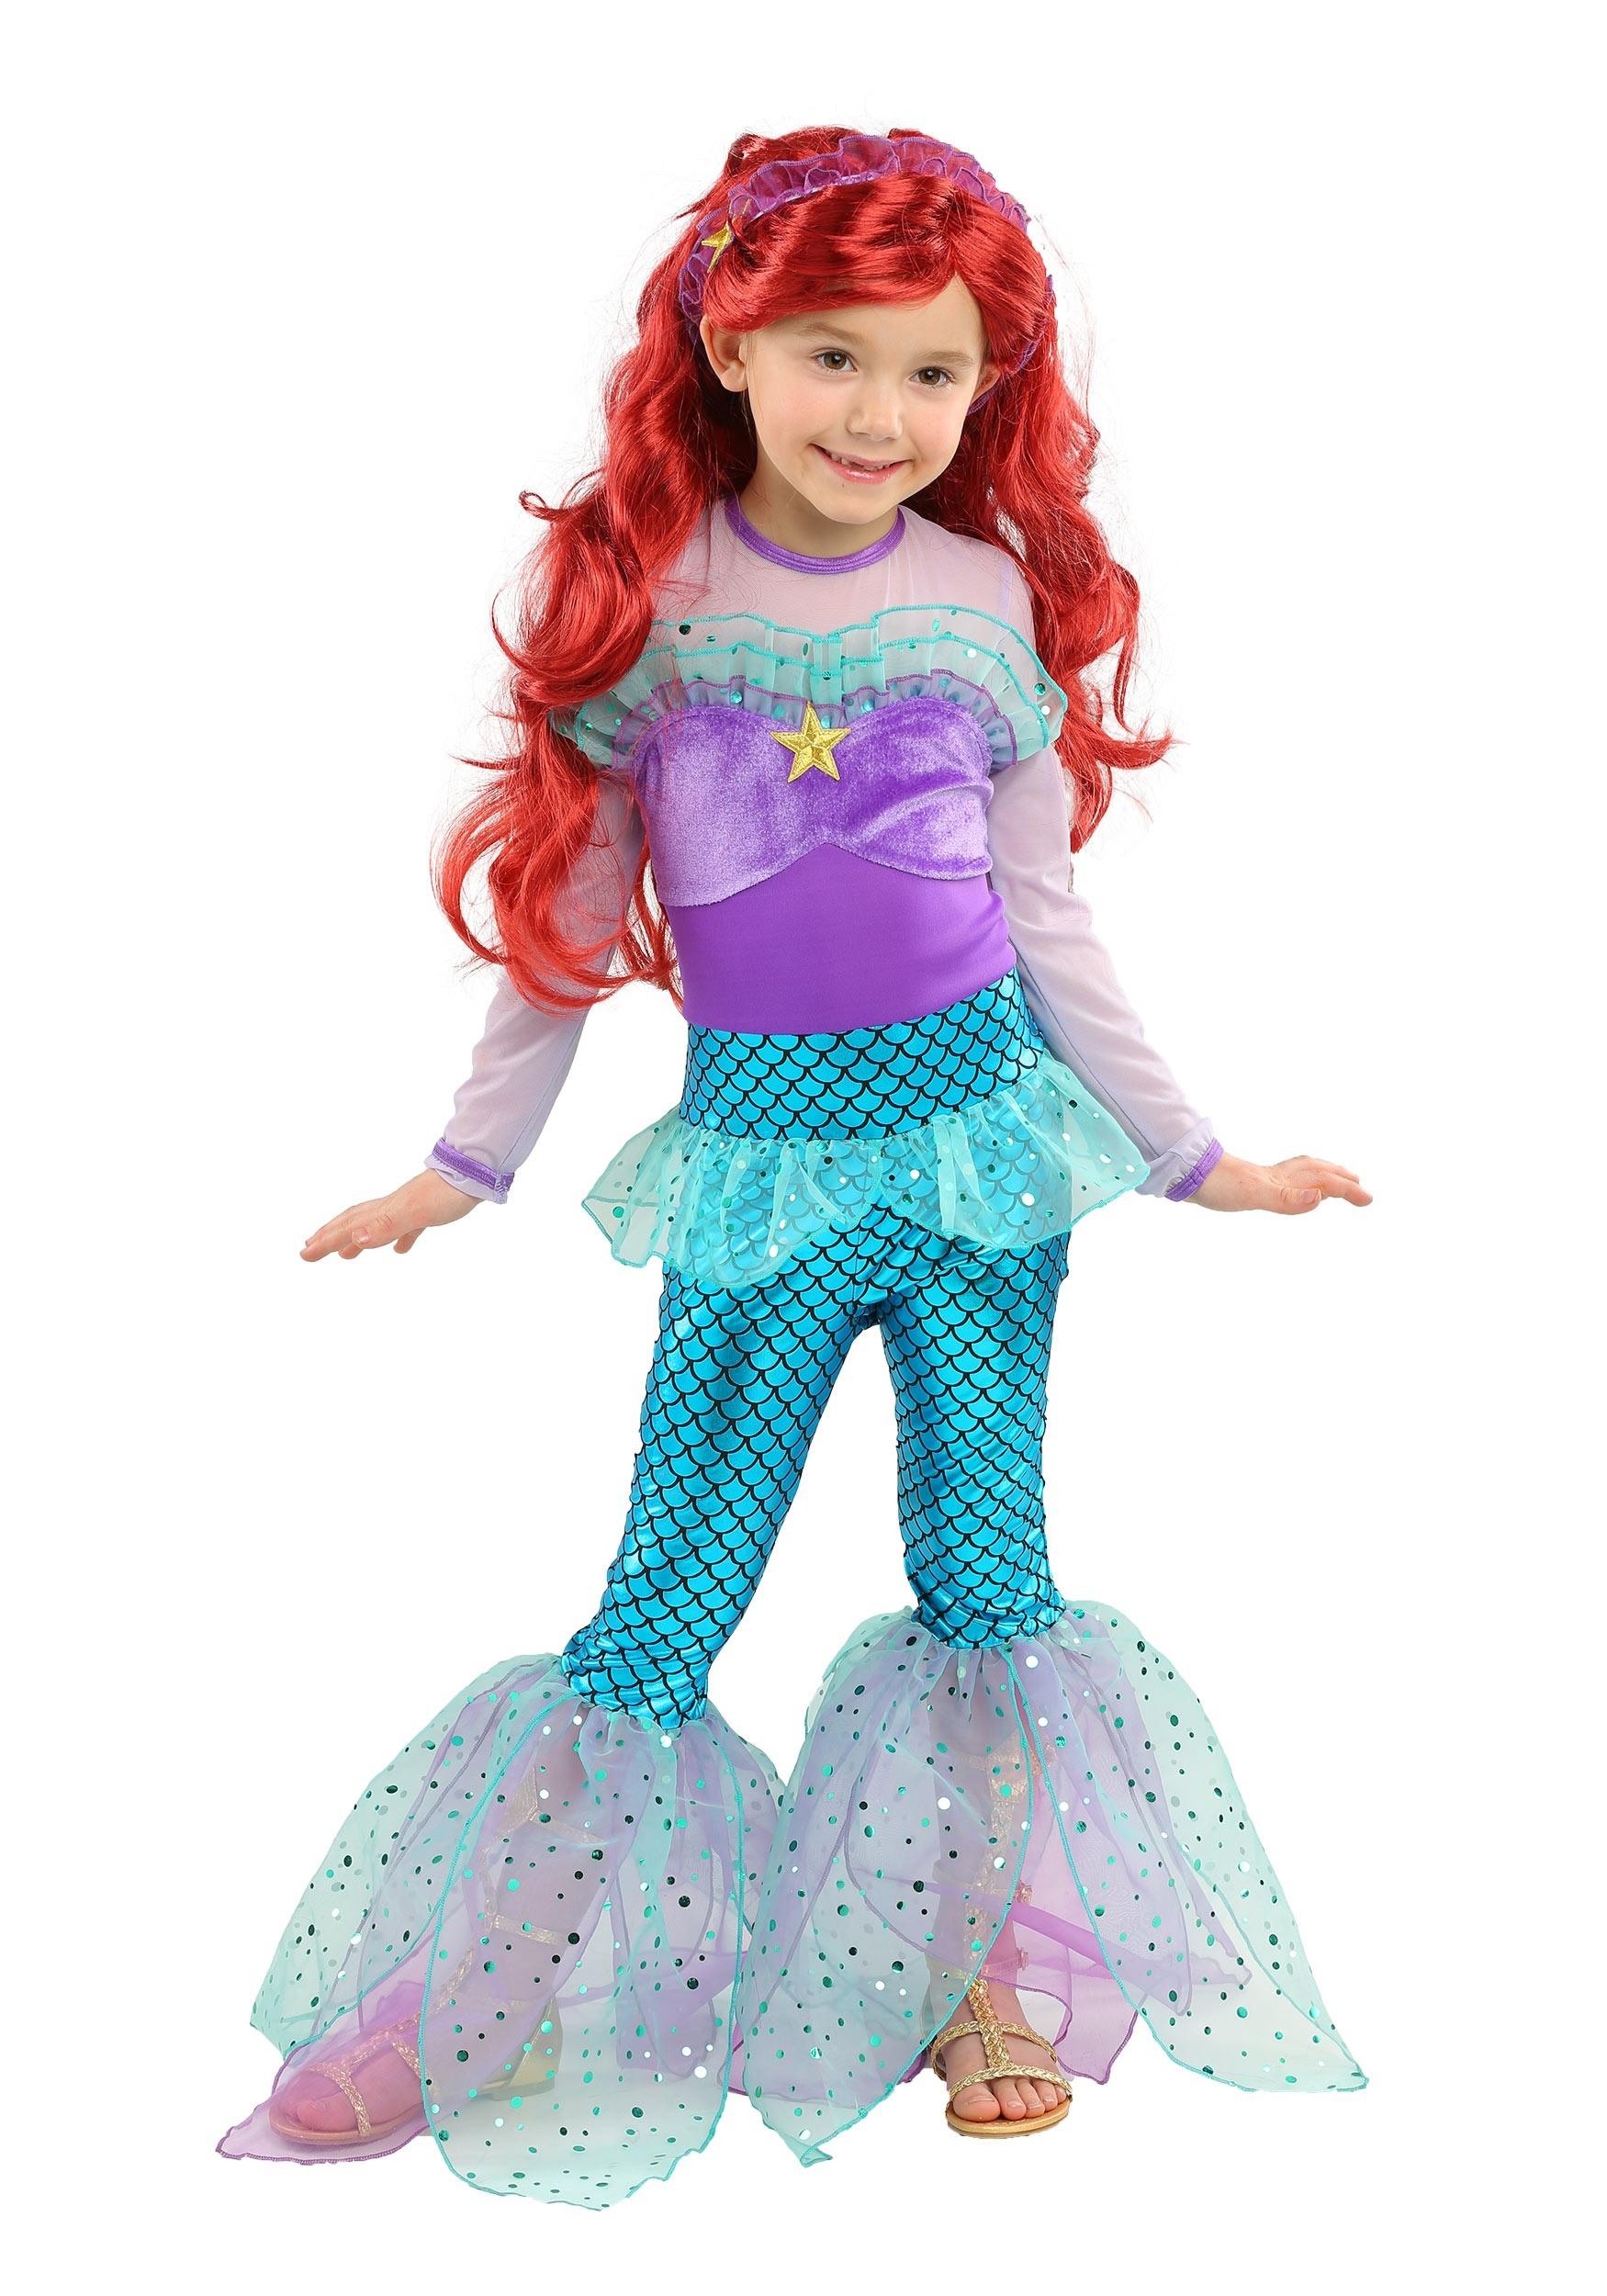 Playful Mermaid Costume For Girls